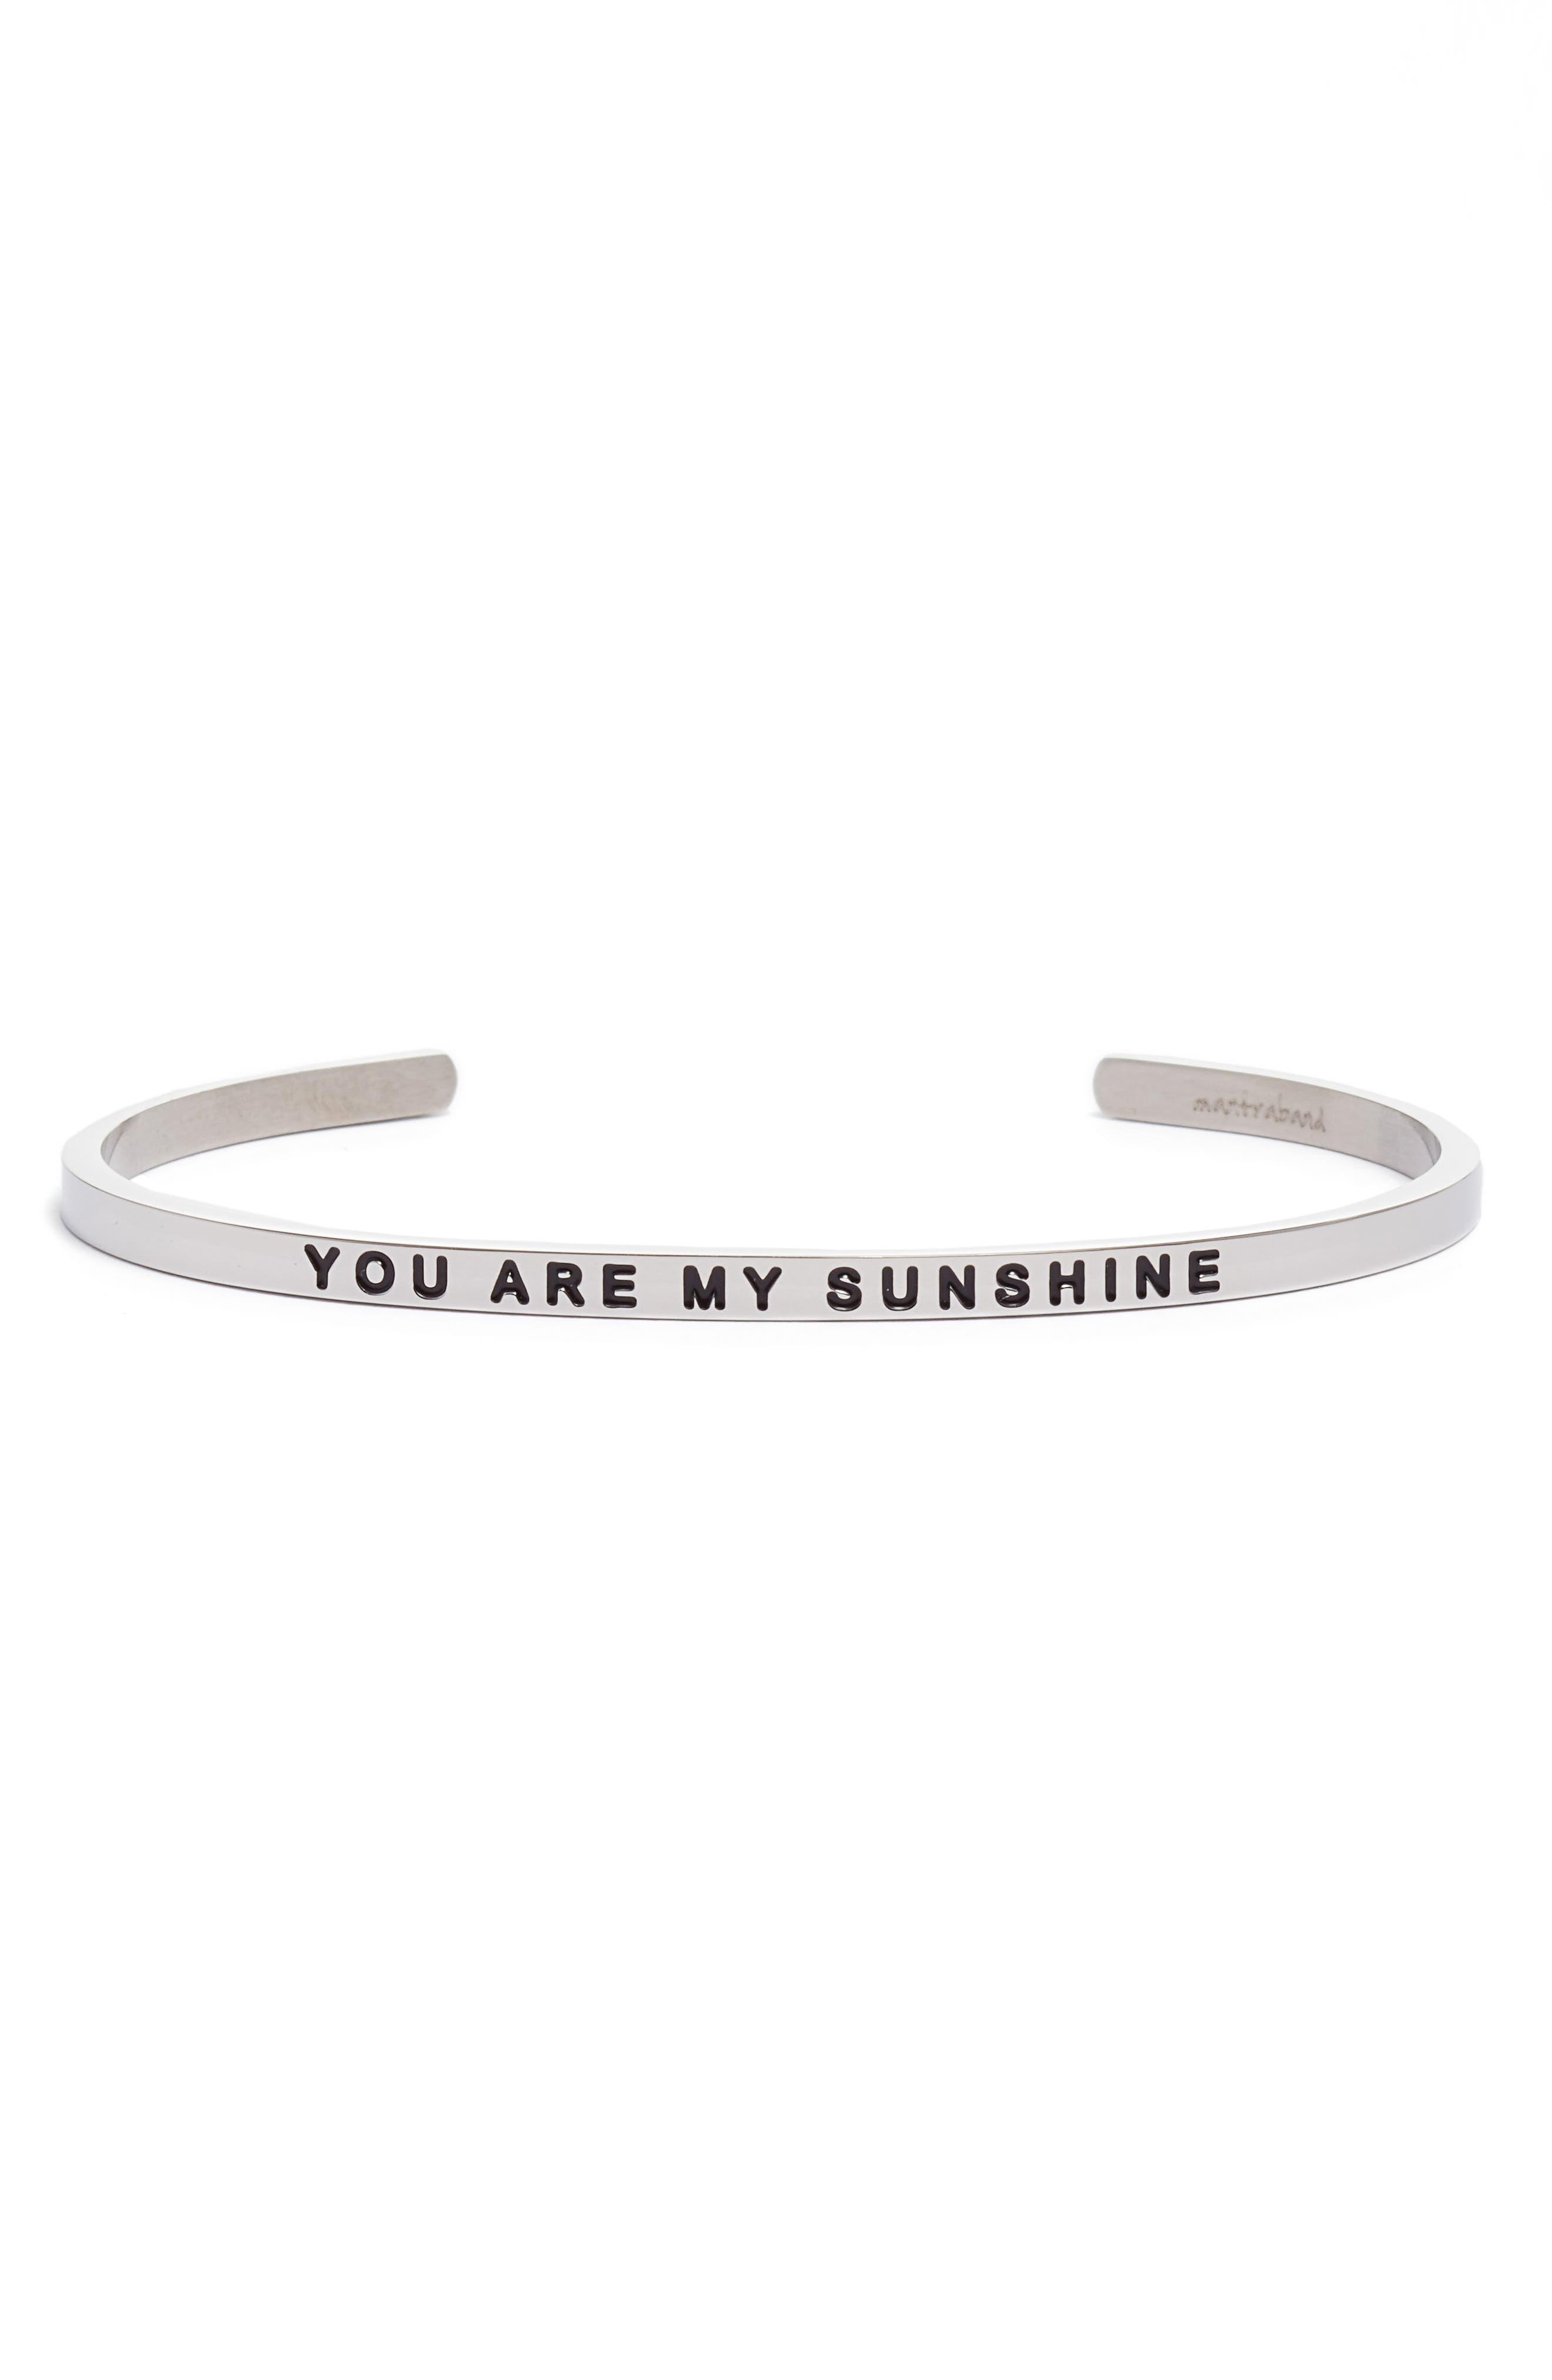 Main Image - MantraBand You Are My Sunshine Engraved Cuff